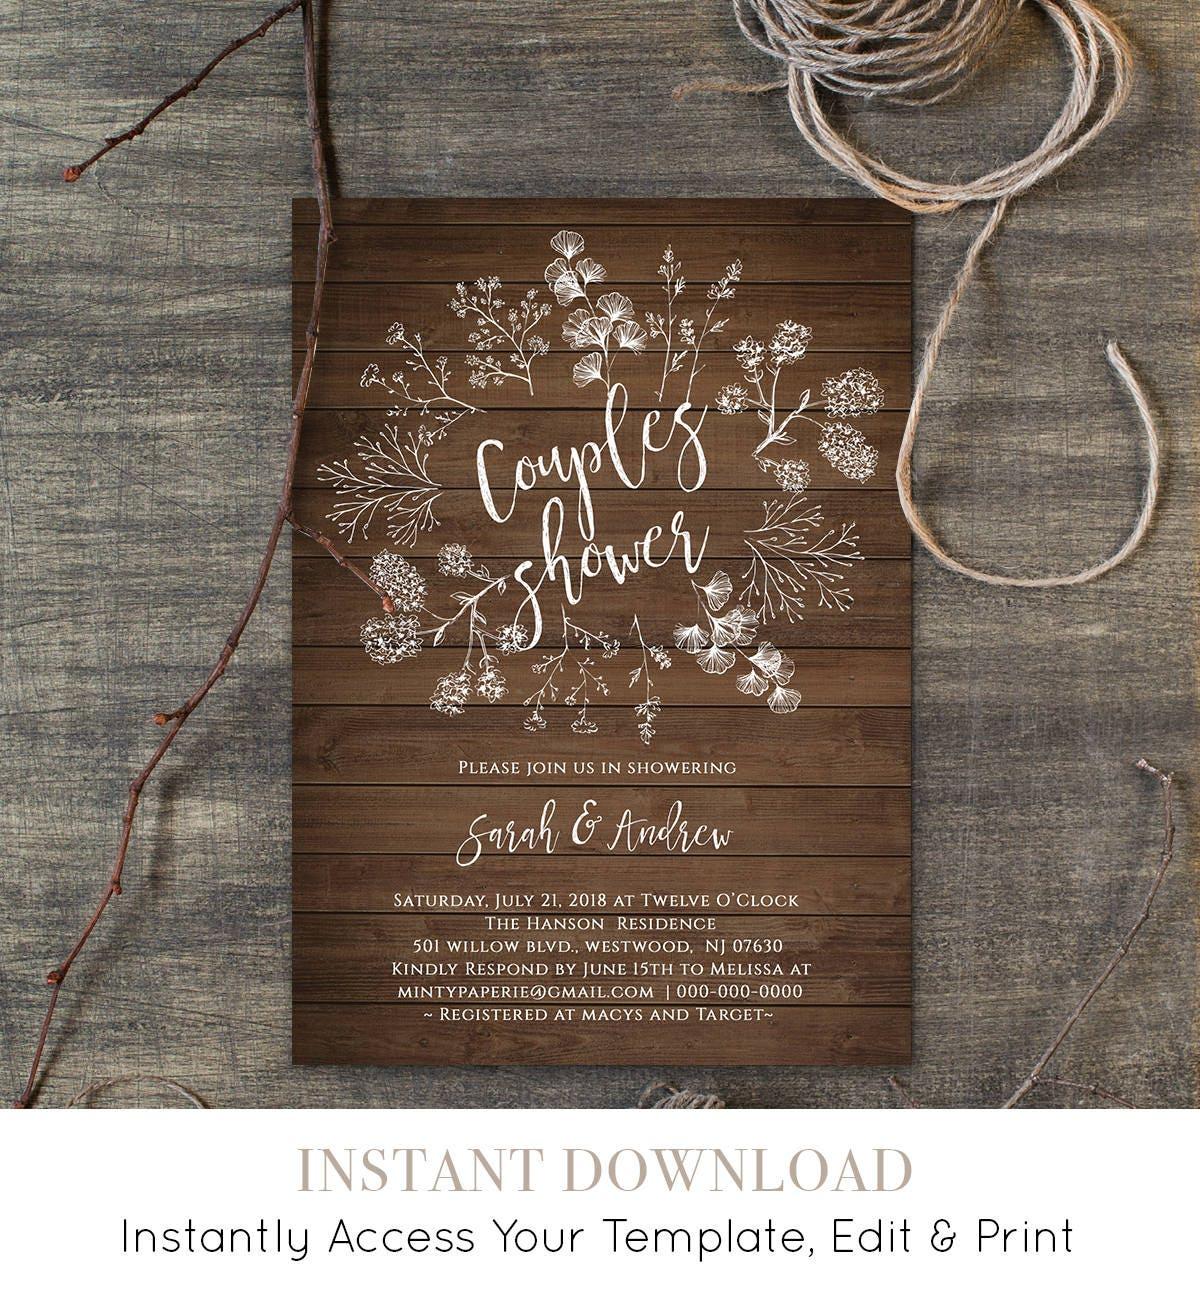 Diy Wedding Invitations Canada: Couples Shower Invitation Template Wedding Shower